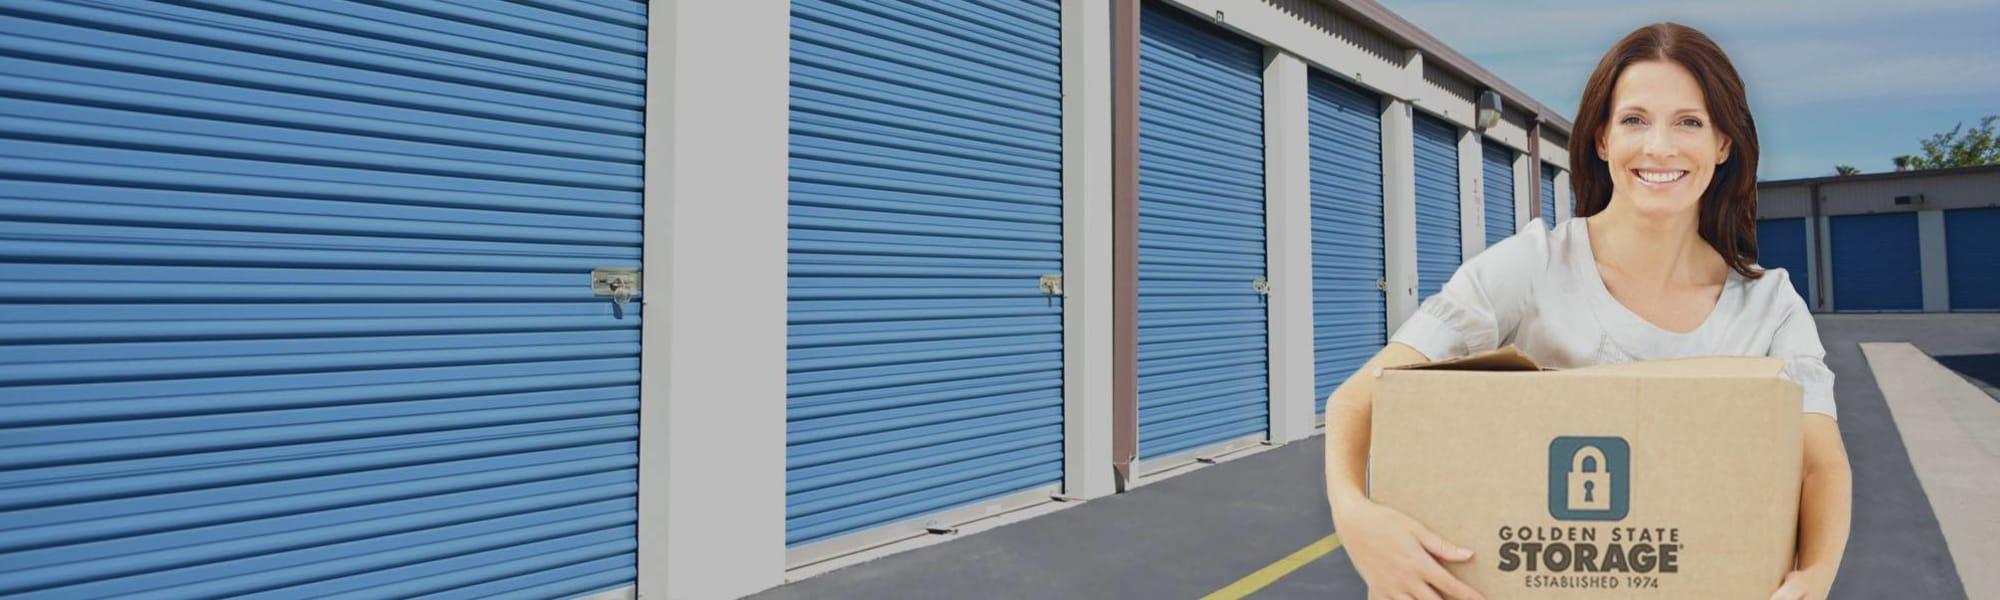 RV & Boat storage at Golden State Storage - Golden Triangle in Santa Clarita, California